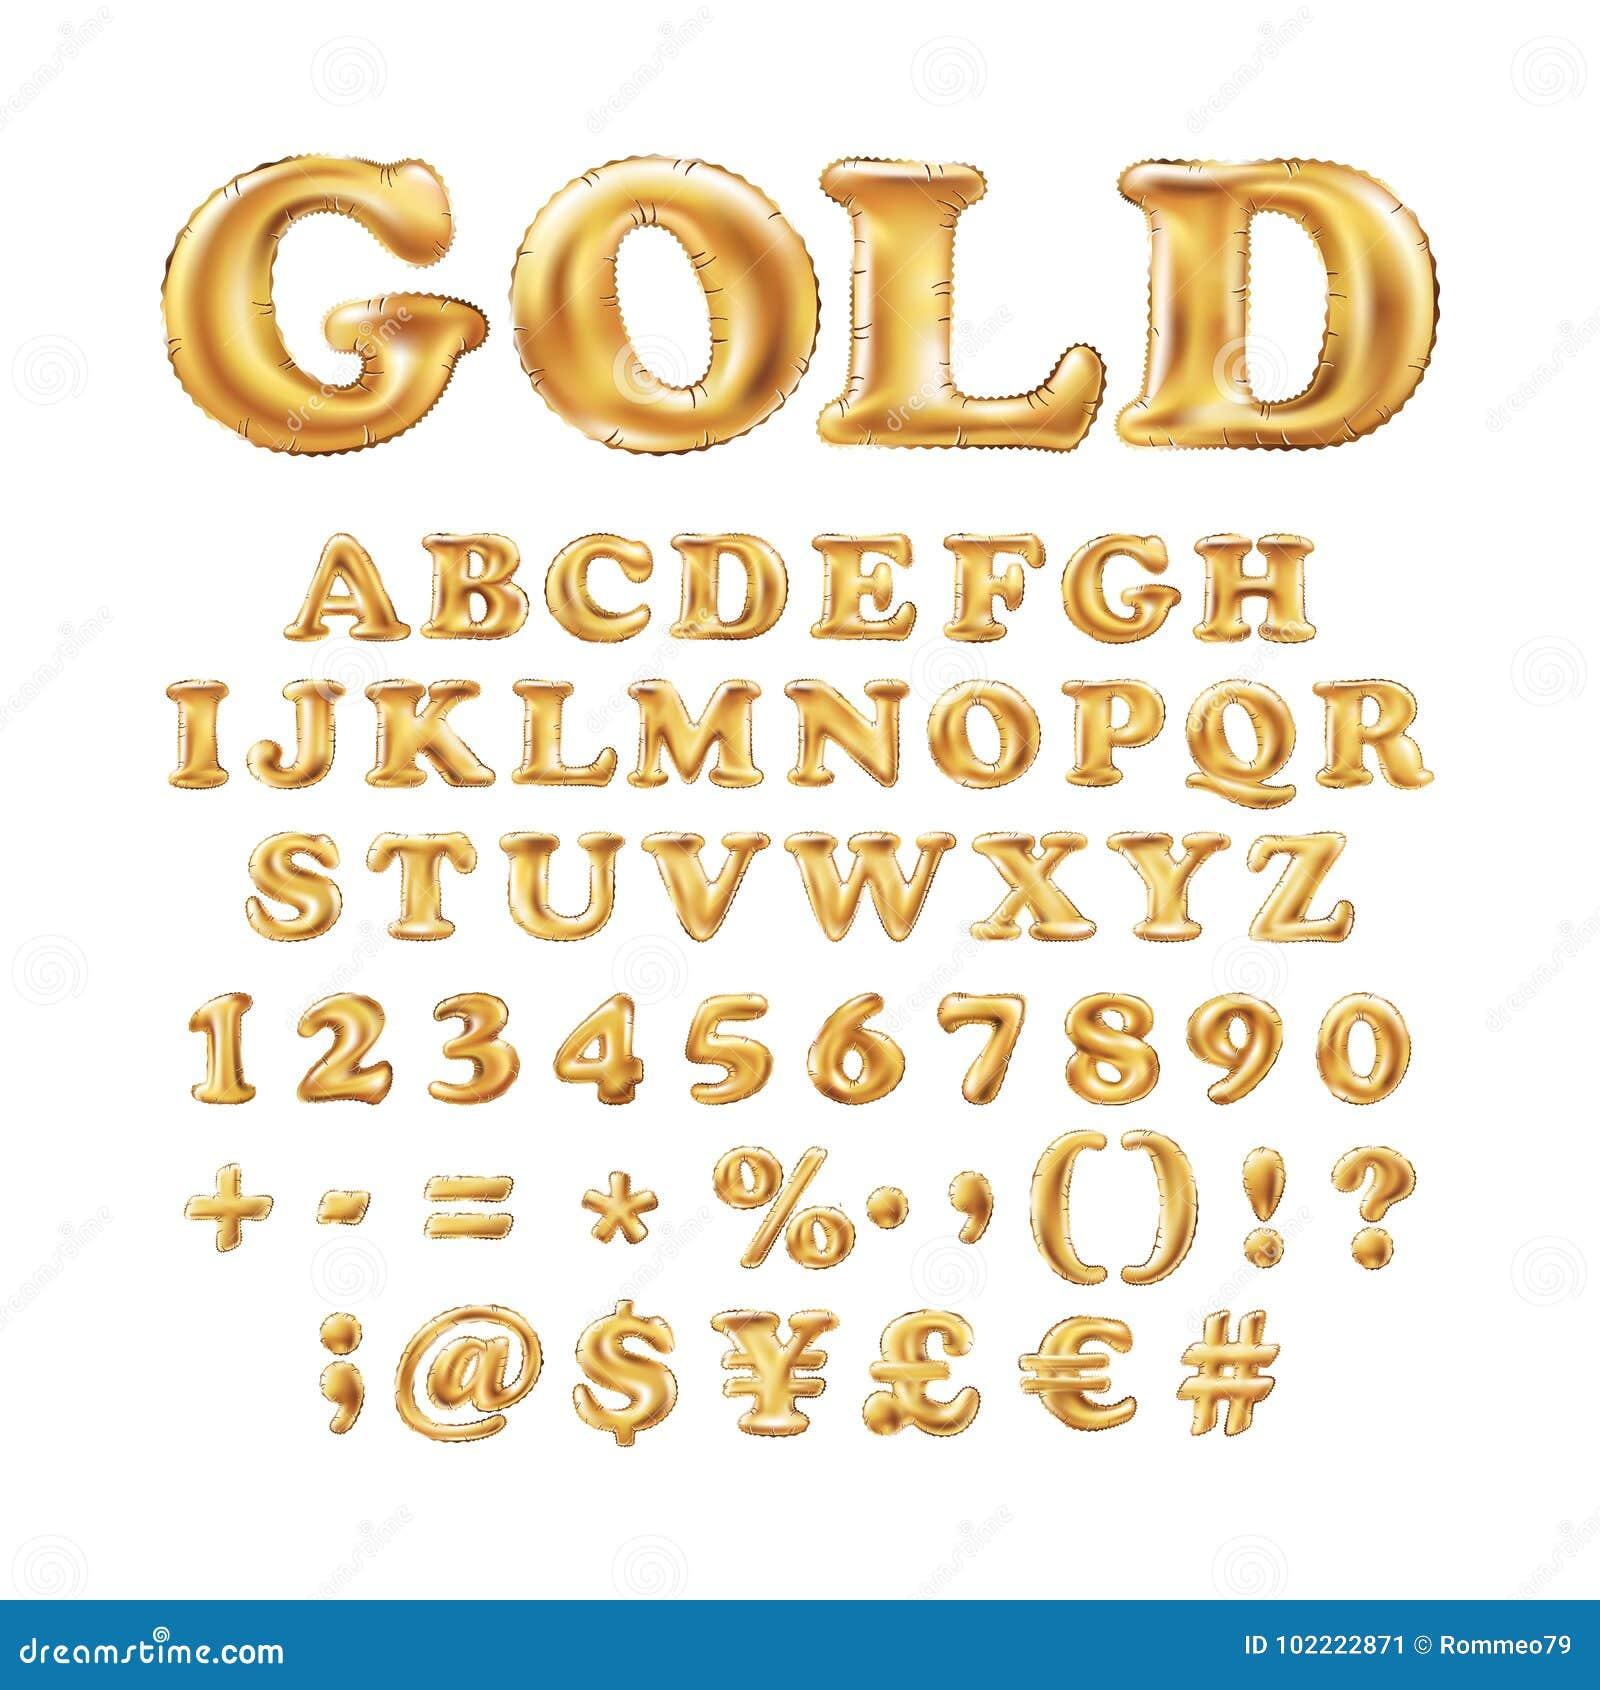 Metallic Gold Alphabet Balloons Golden Letter Type For Text